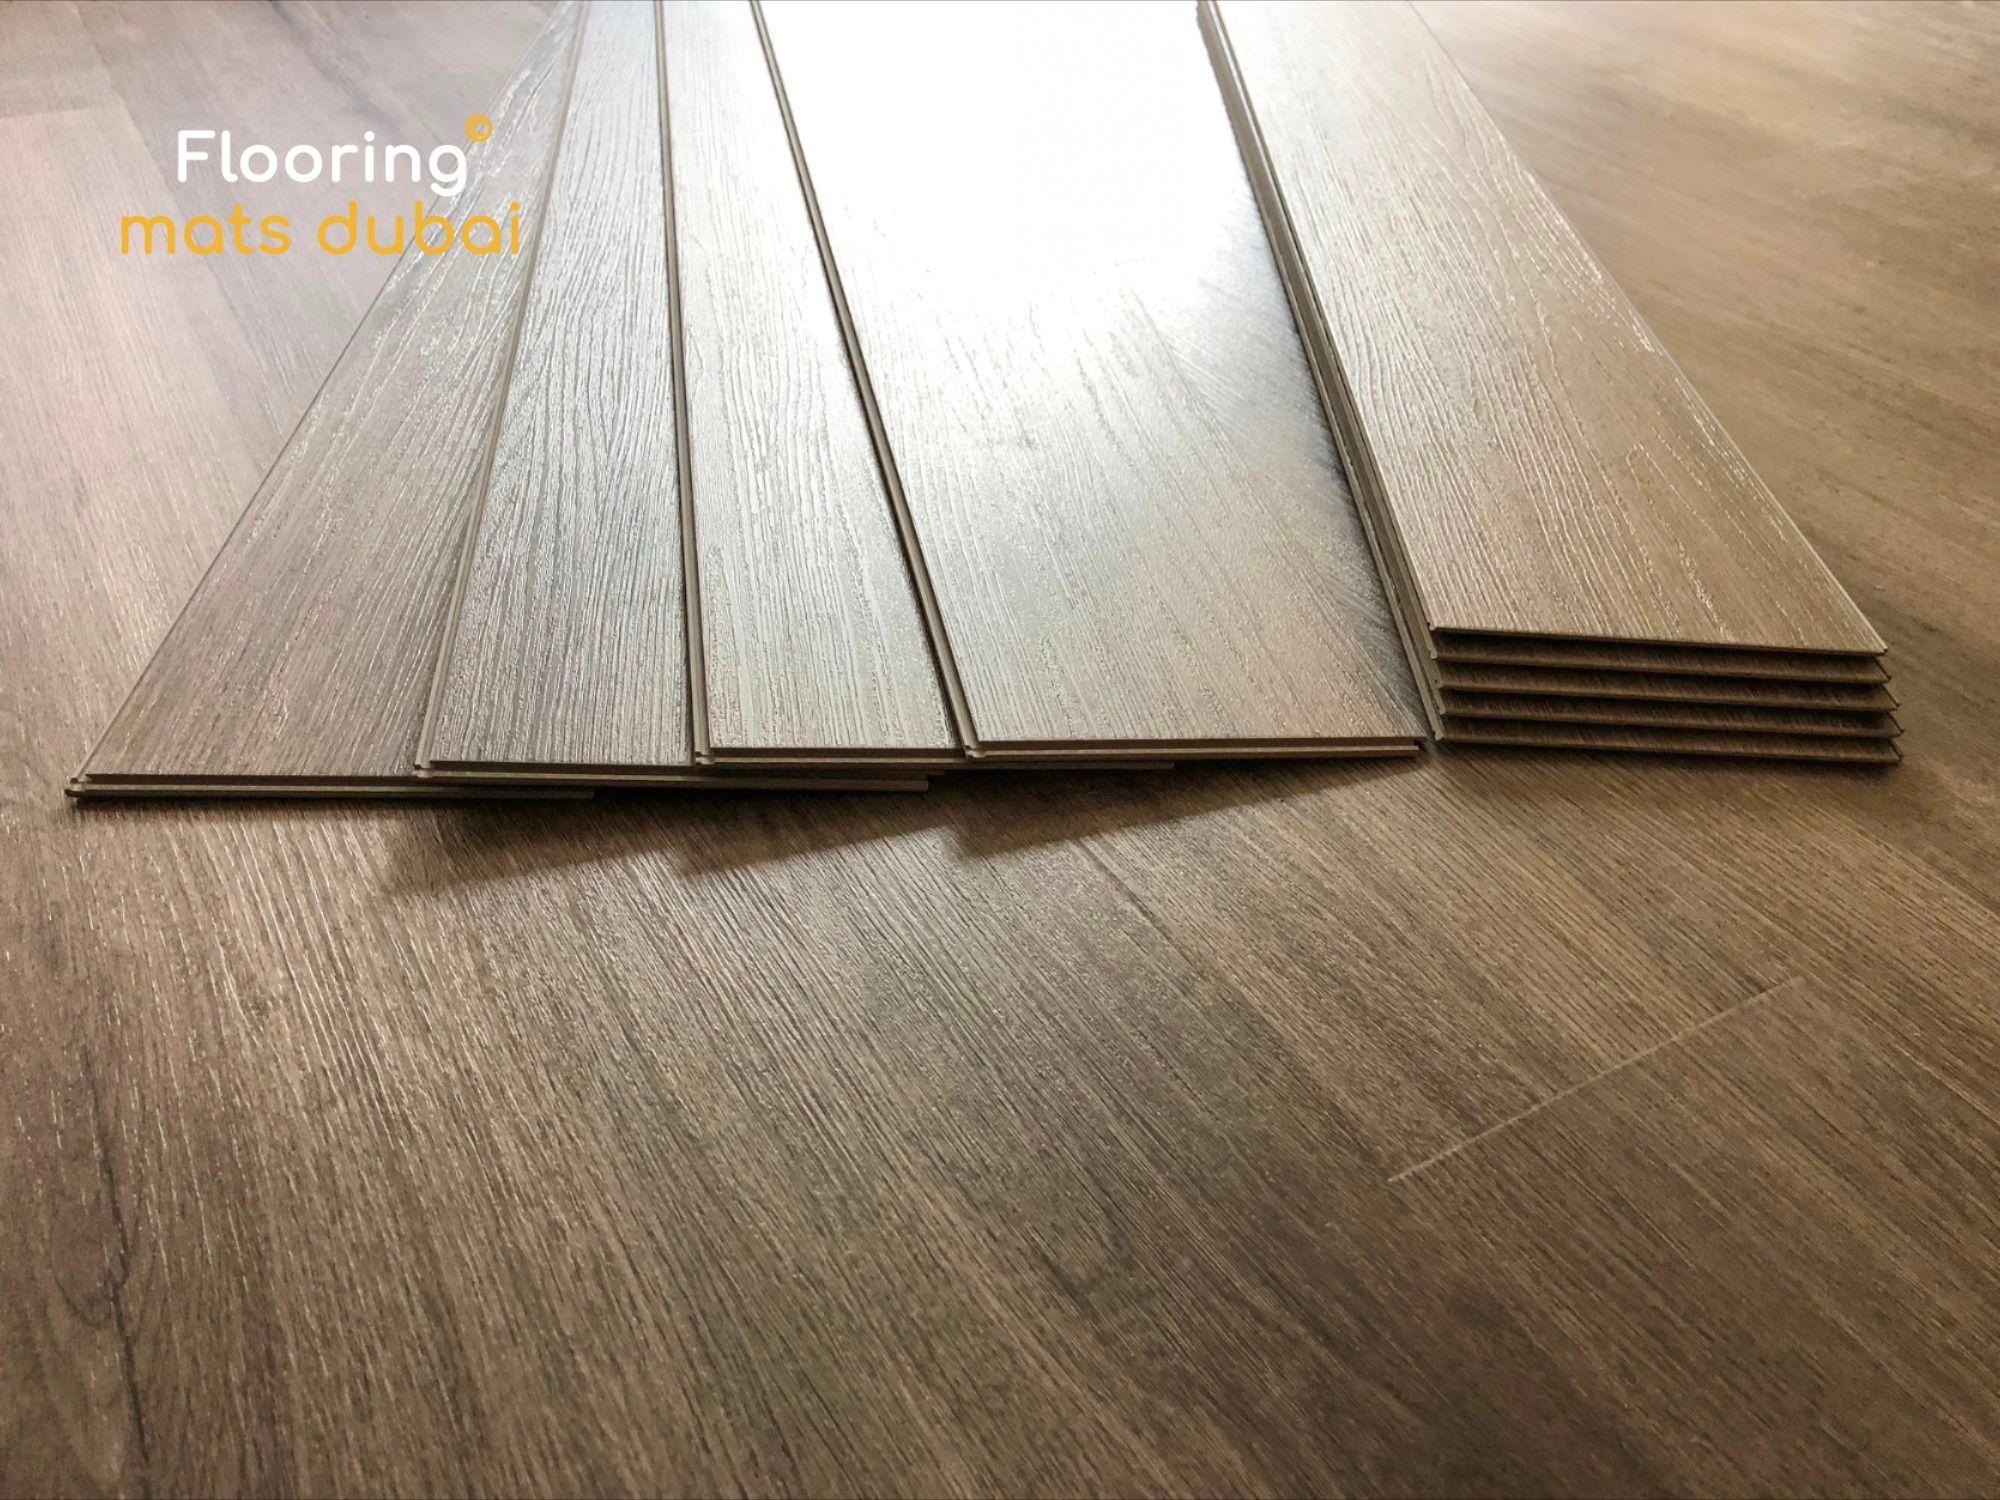 Best Vinyl Flooring Ideas 2020 In 2020 Vinyl Plank Flooring Installing Vinyl Plank Flooring Vinyl Flooring